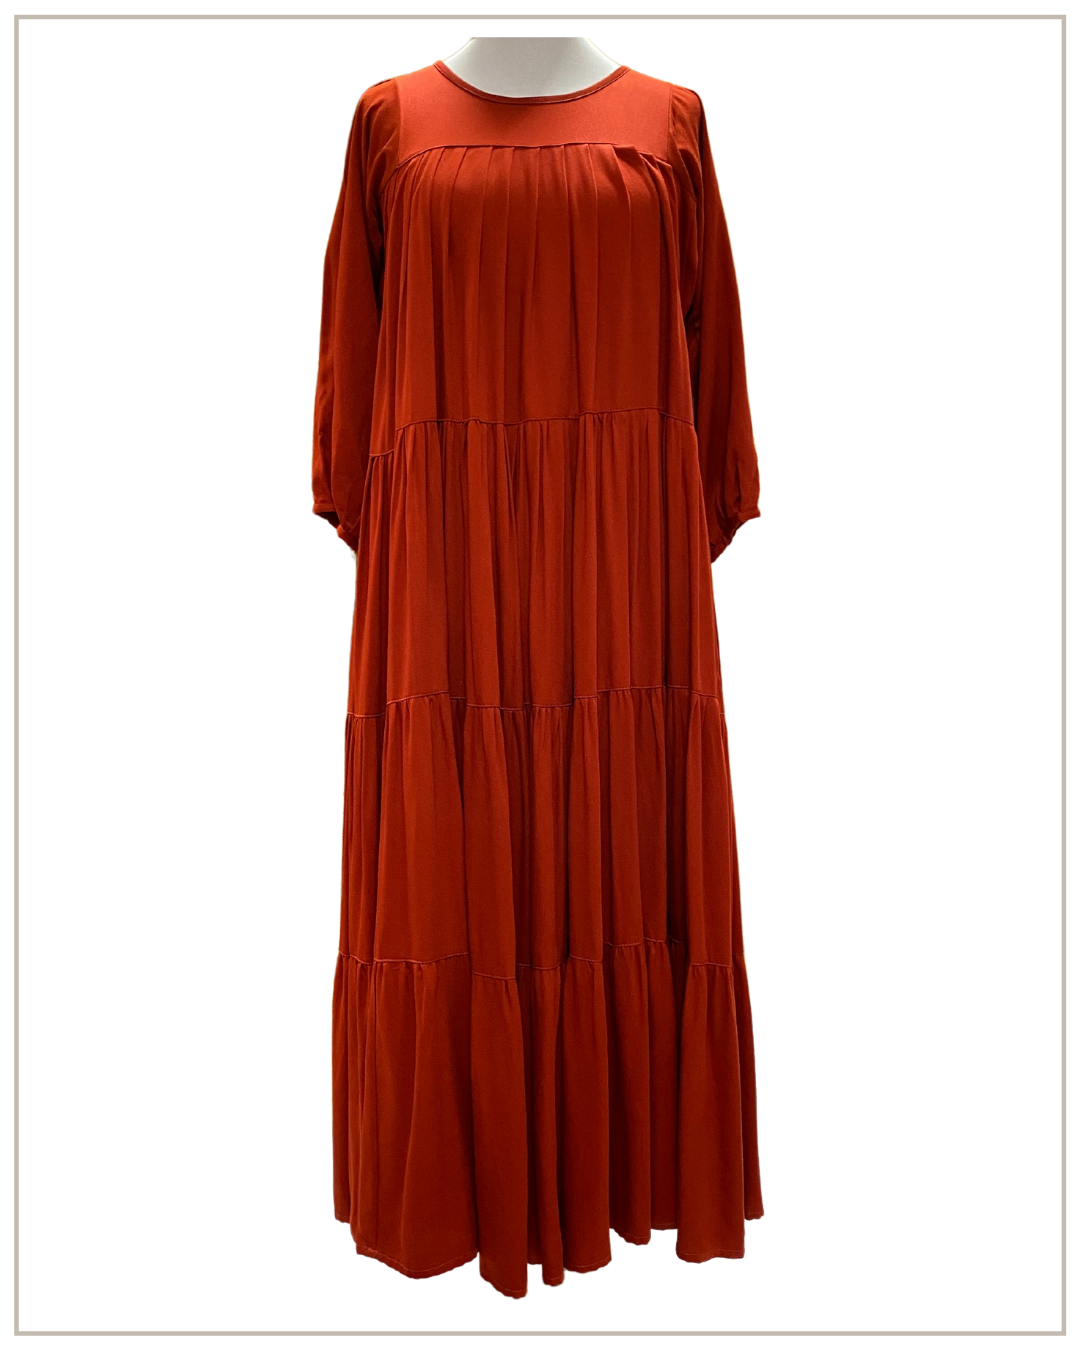 SHTAPEL viskozės suknelė Jarusnoe